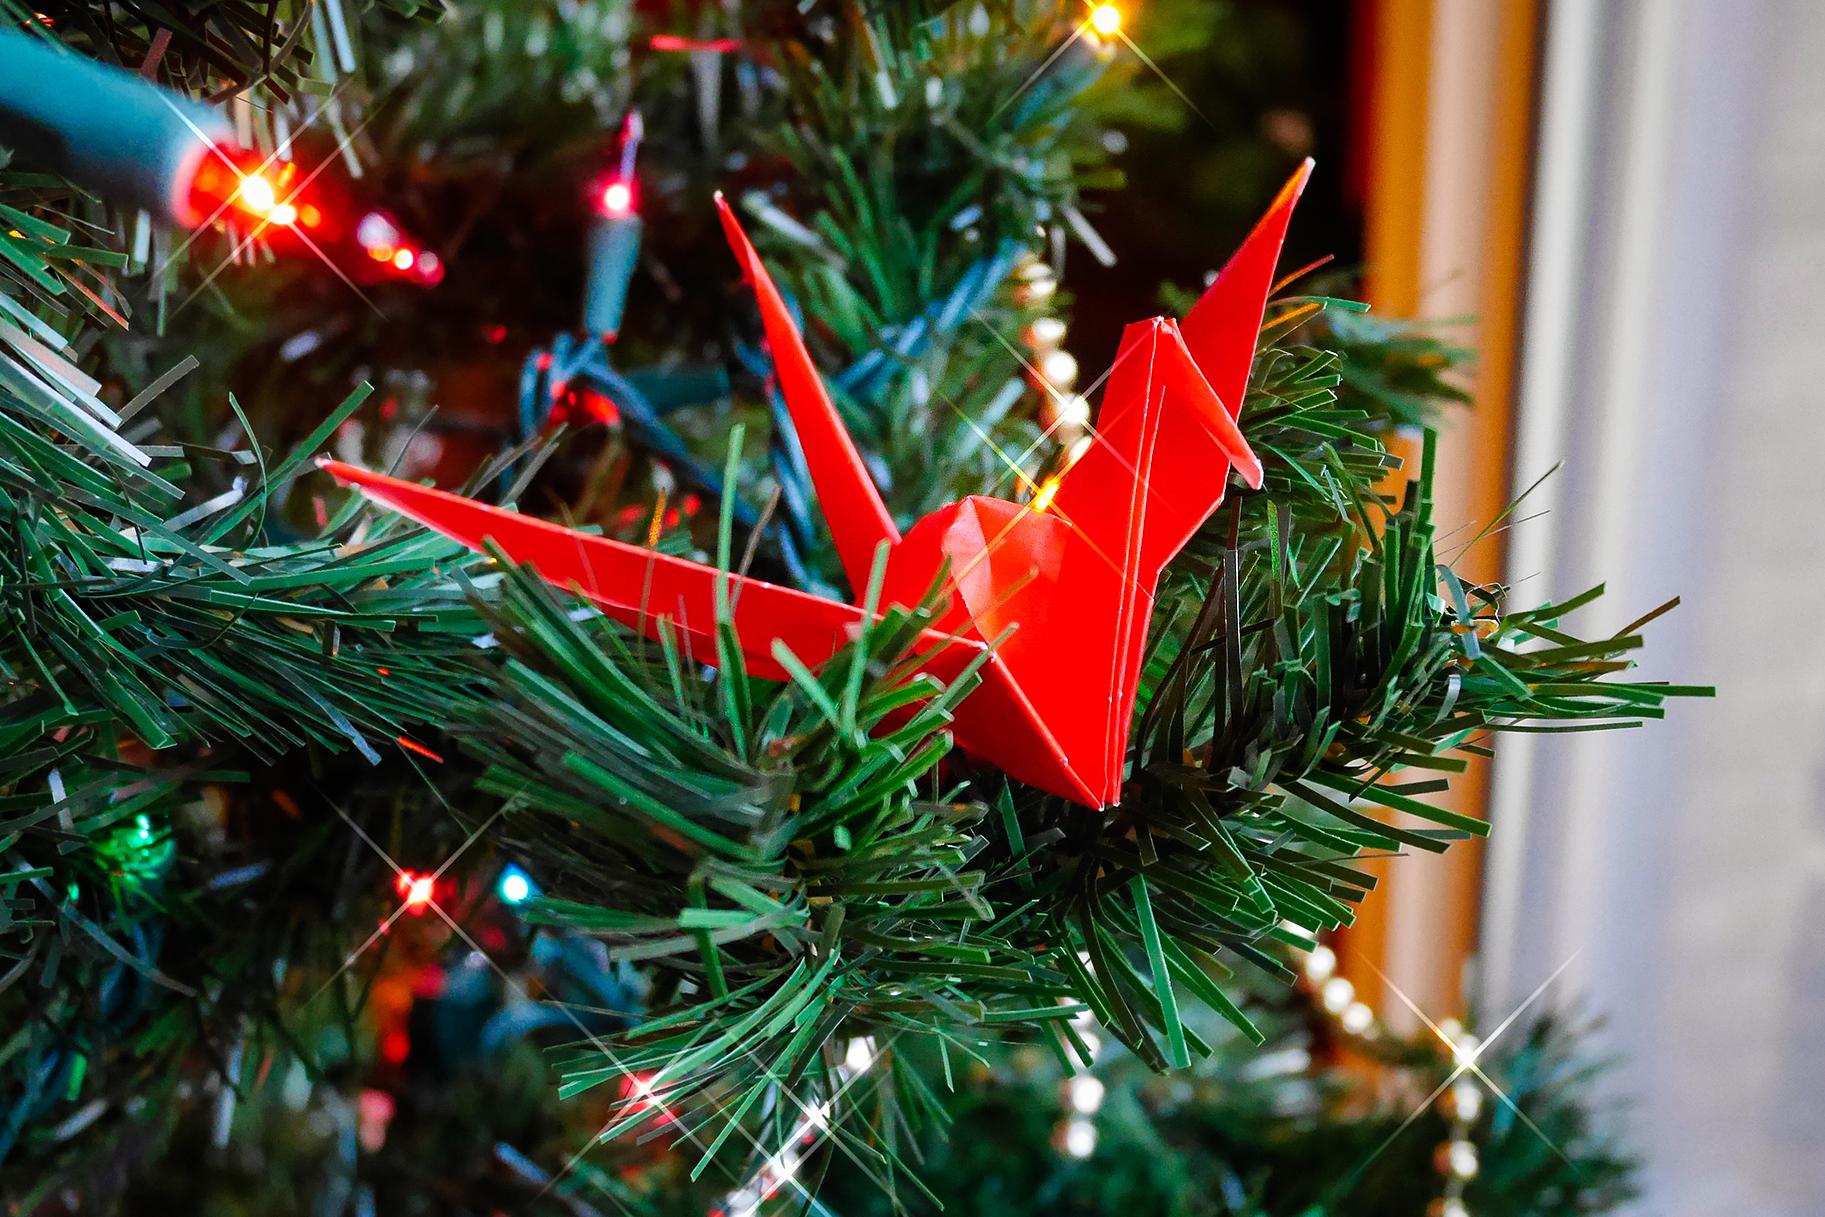 Wierd Christmas Ornament.Christmas Tree Decorations From Around The World Jetset